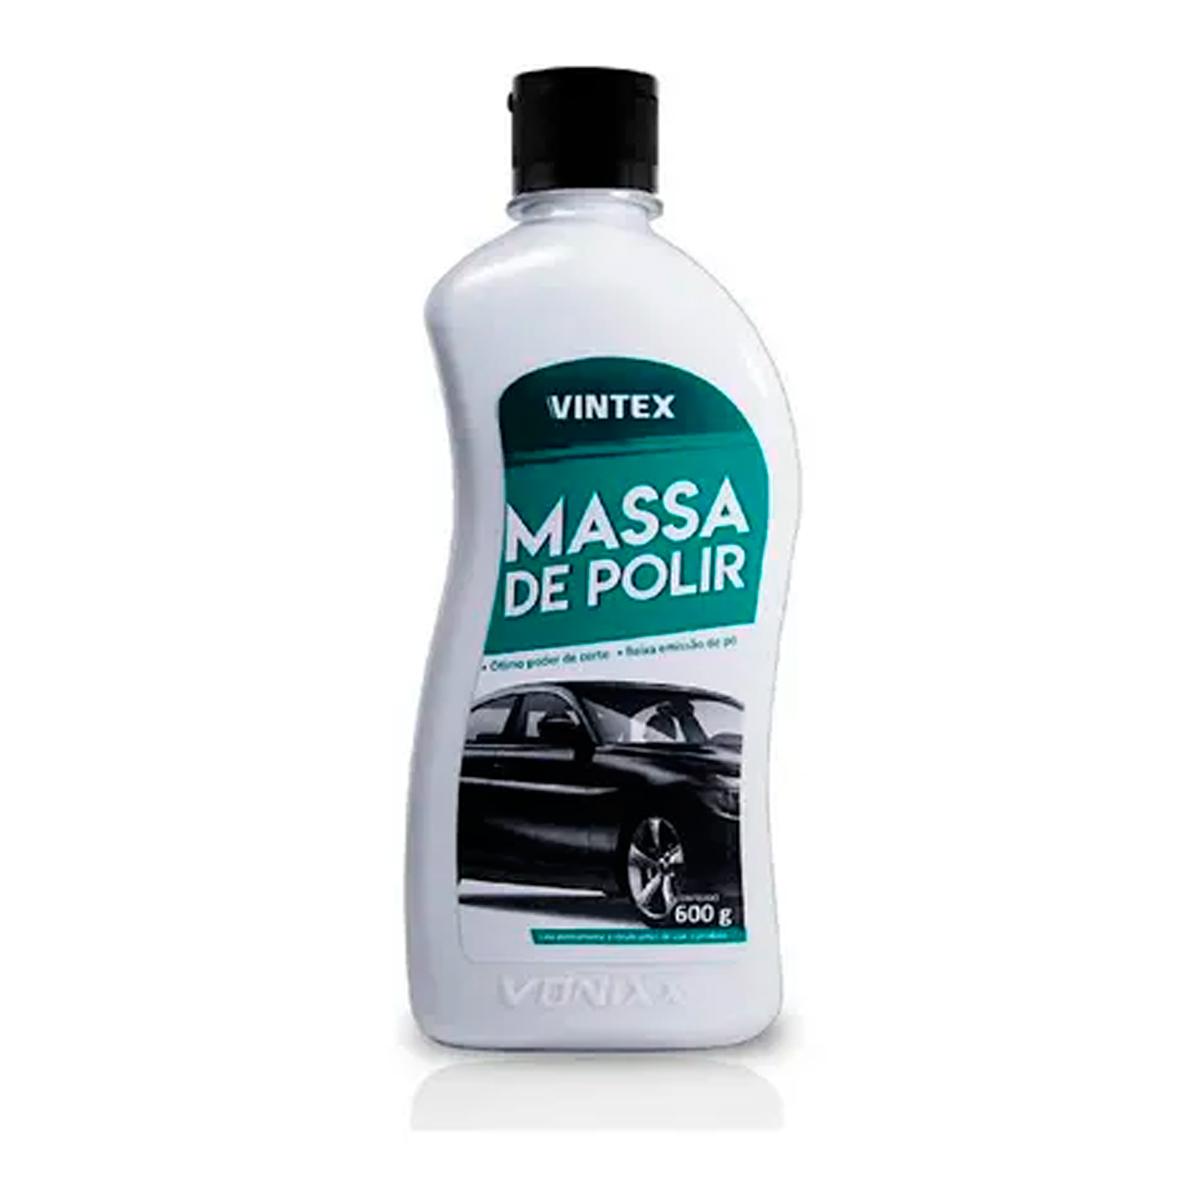 Massa de Polir 600g - Vintex/Vonixx